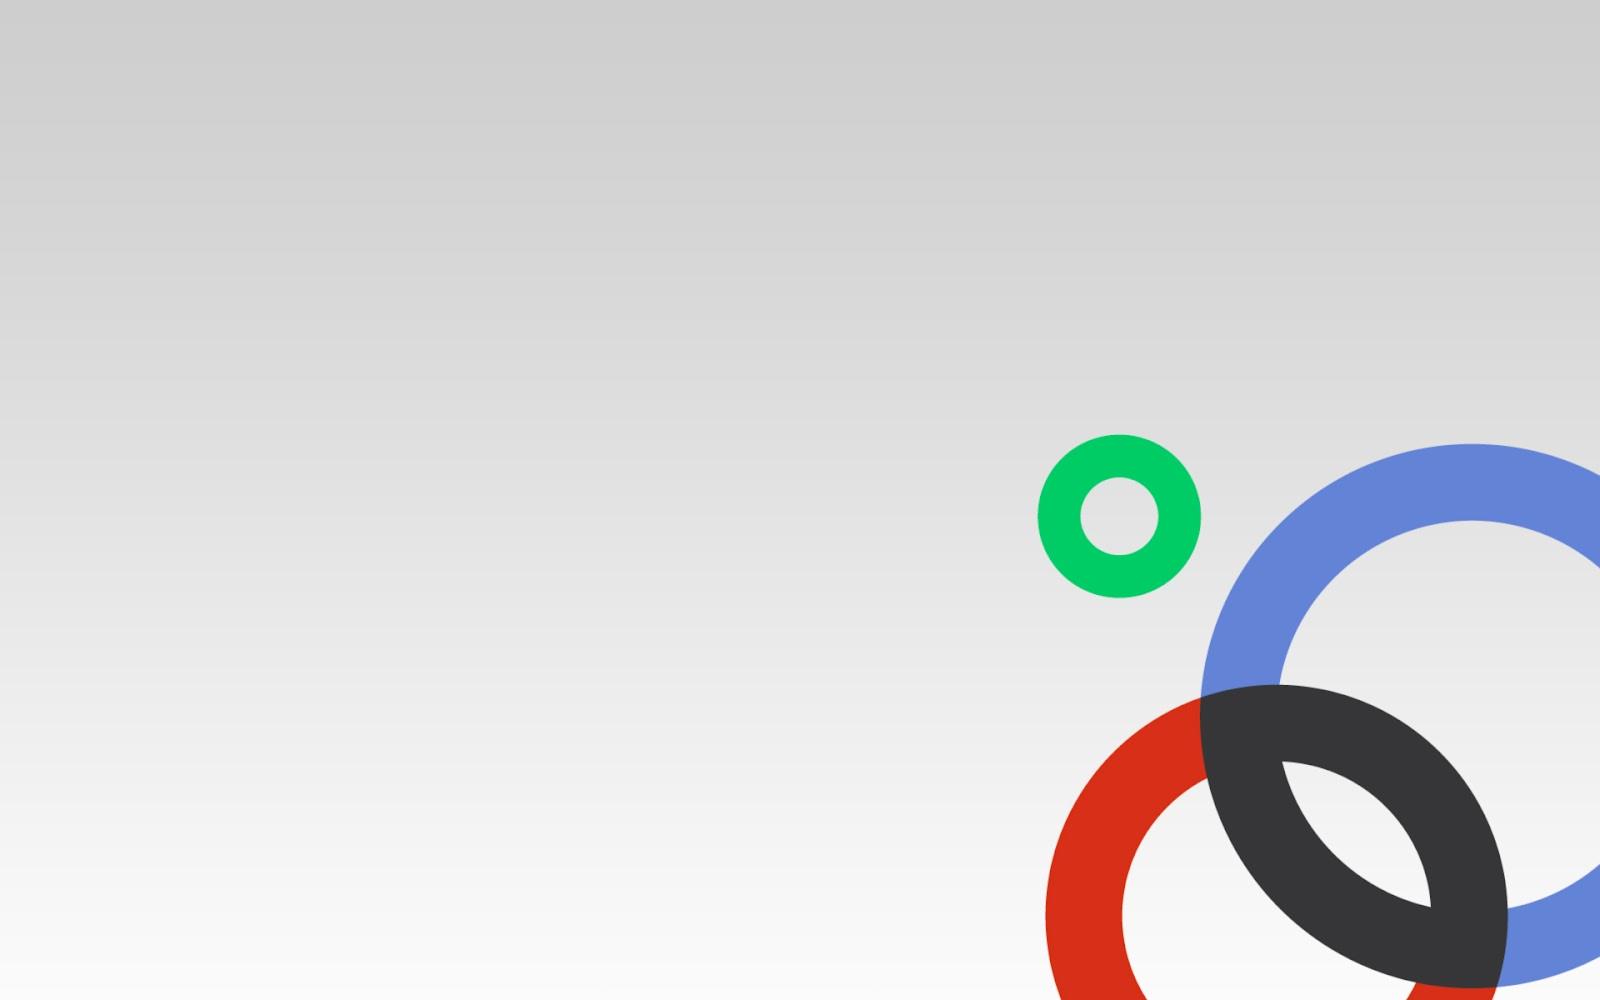 Free Download Pranav Namoju High Resolution Google Plus